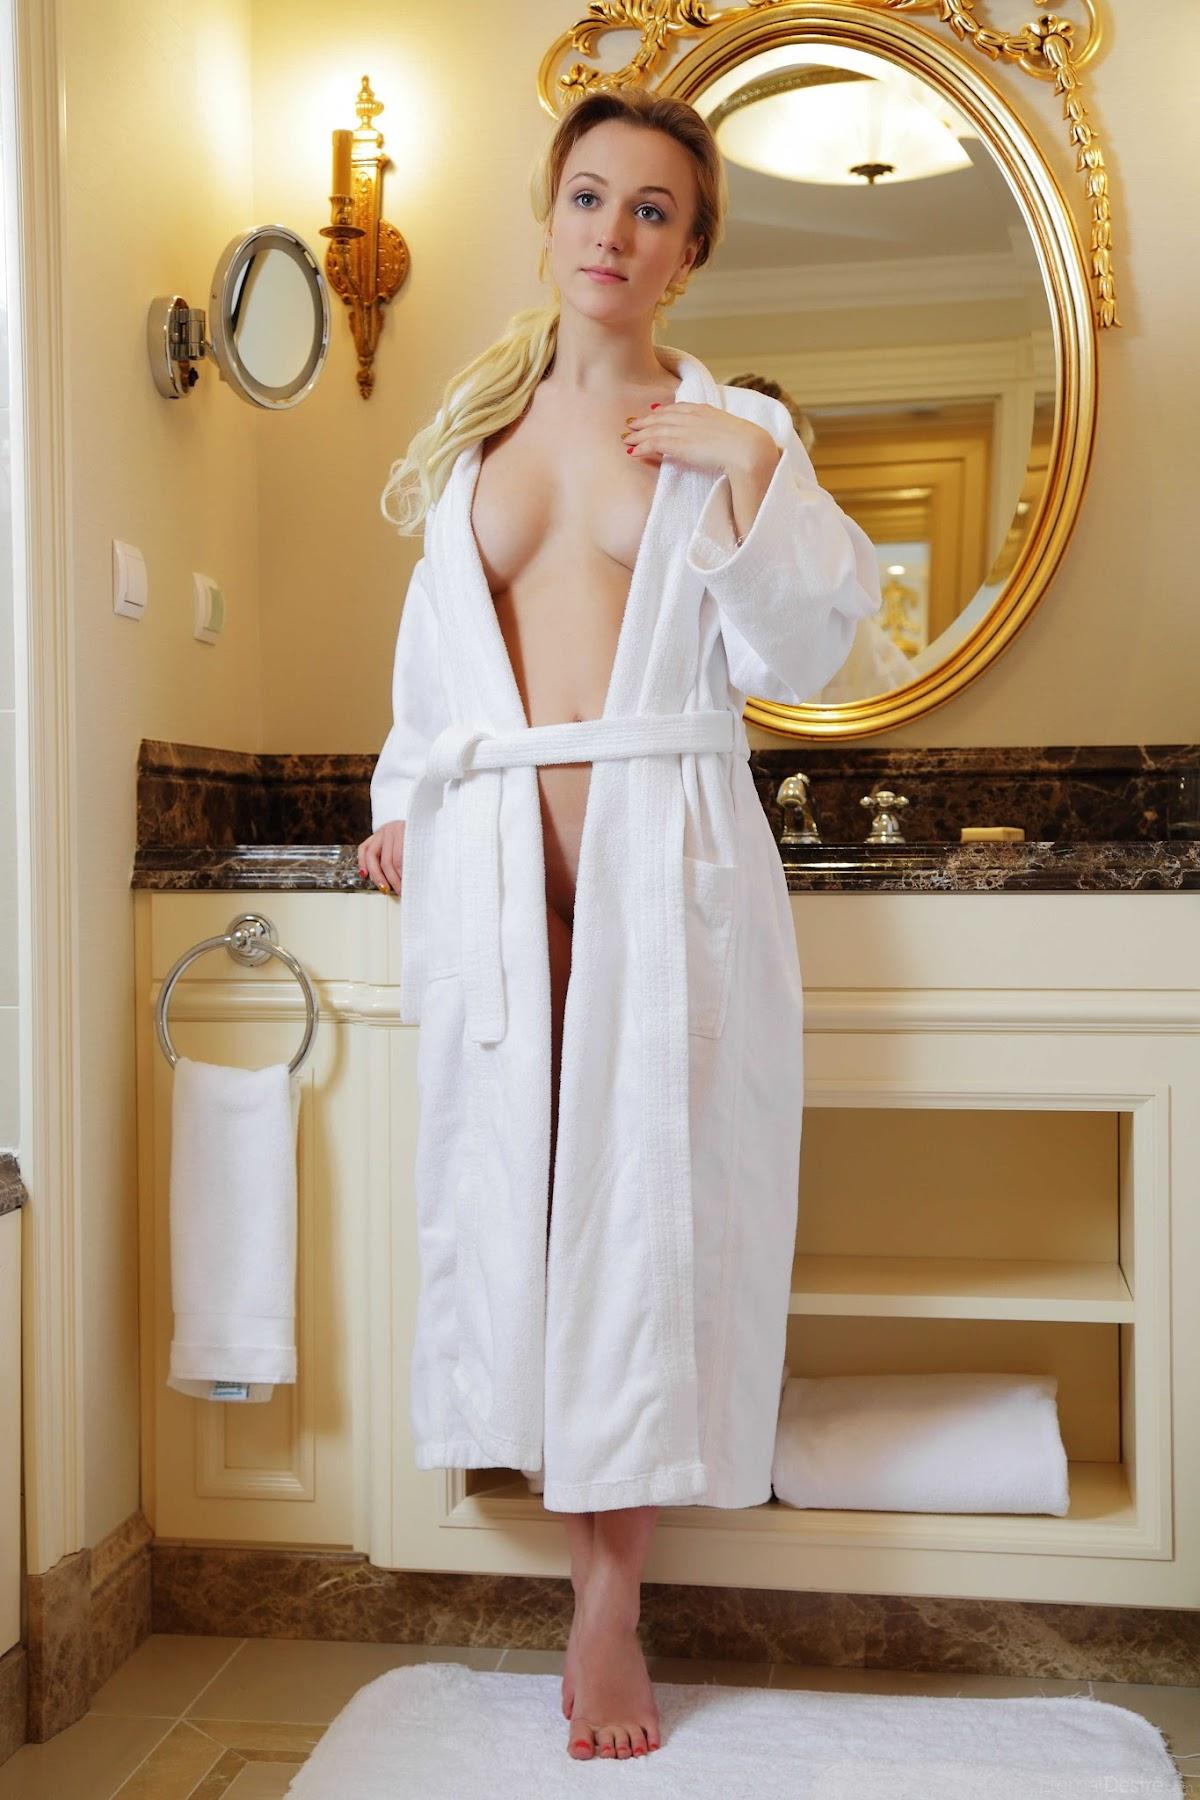 golie-v-halatikah-smotret-krasiviy-seks-v-tualete